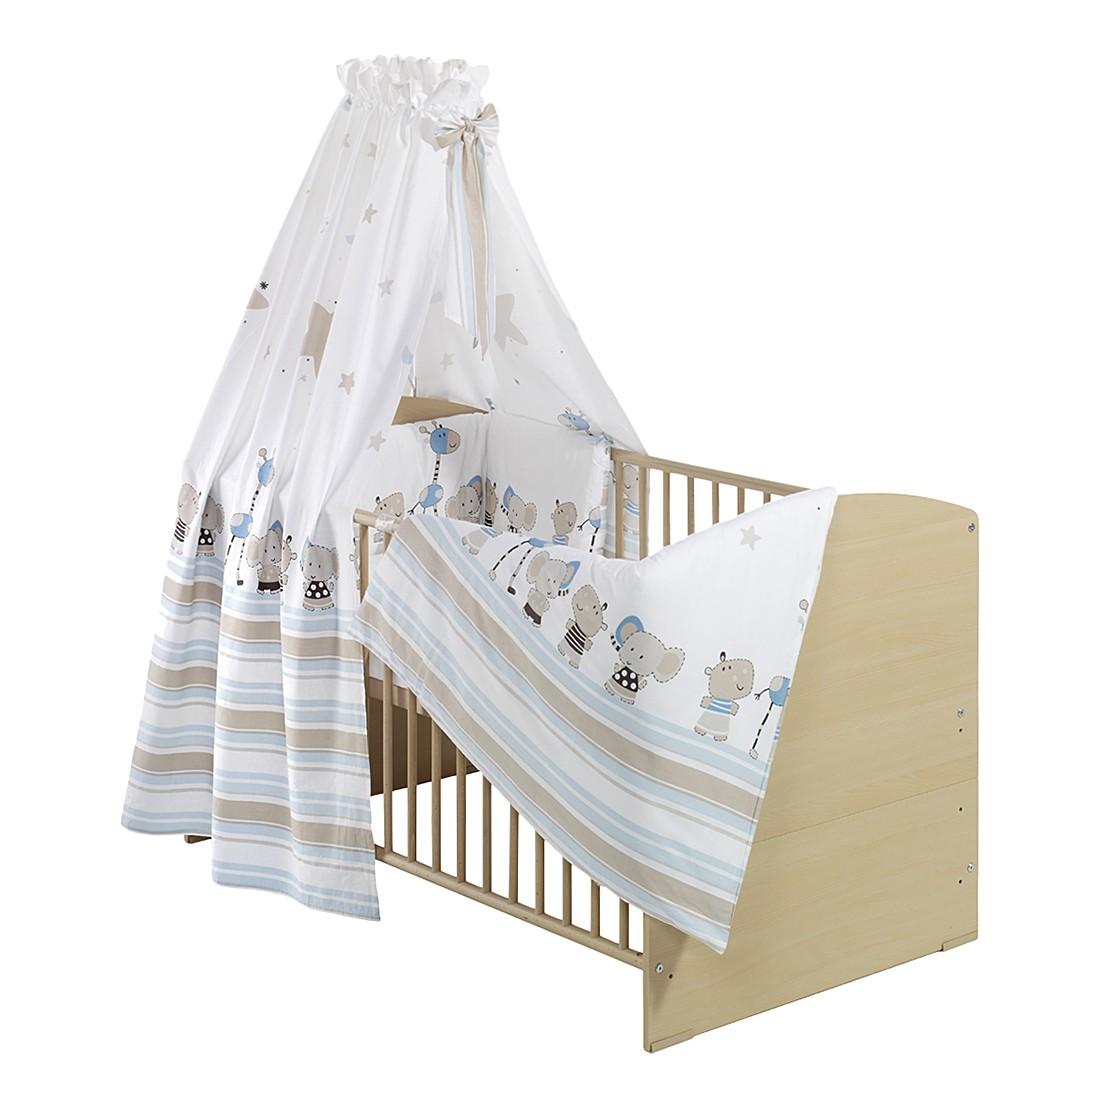 Komplettbett CLASSIC LINE (inkl. Matratze & Textil-Set) – Buche massiv – lackiert – Textil: Gelb gestreift, Schardt online bestellen